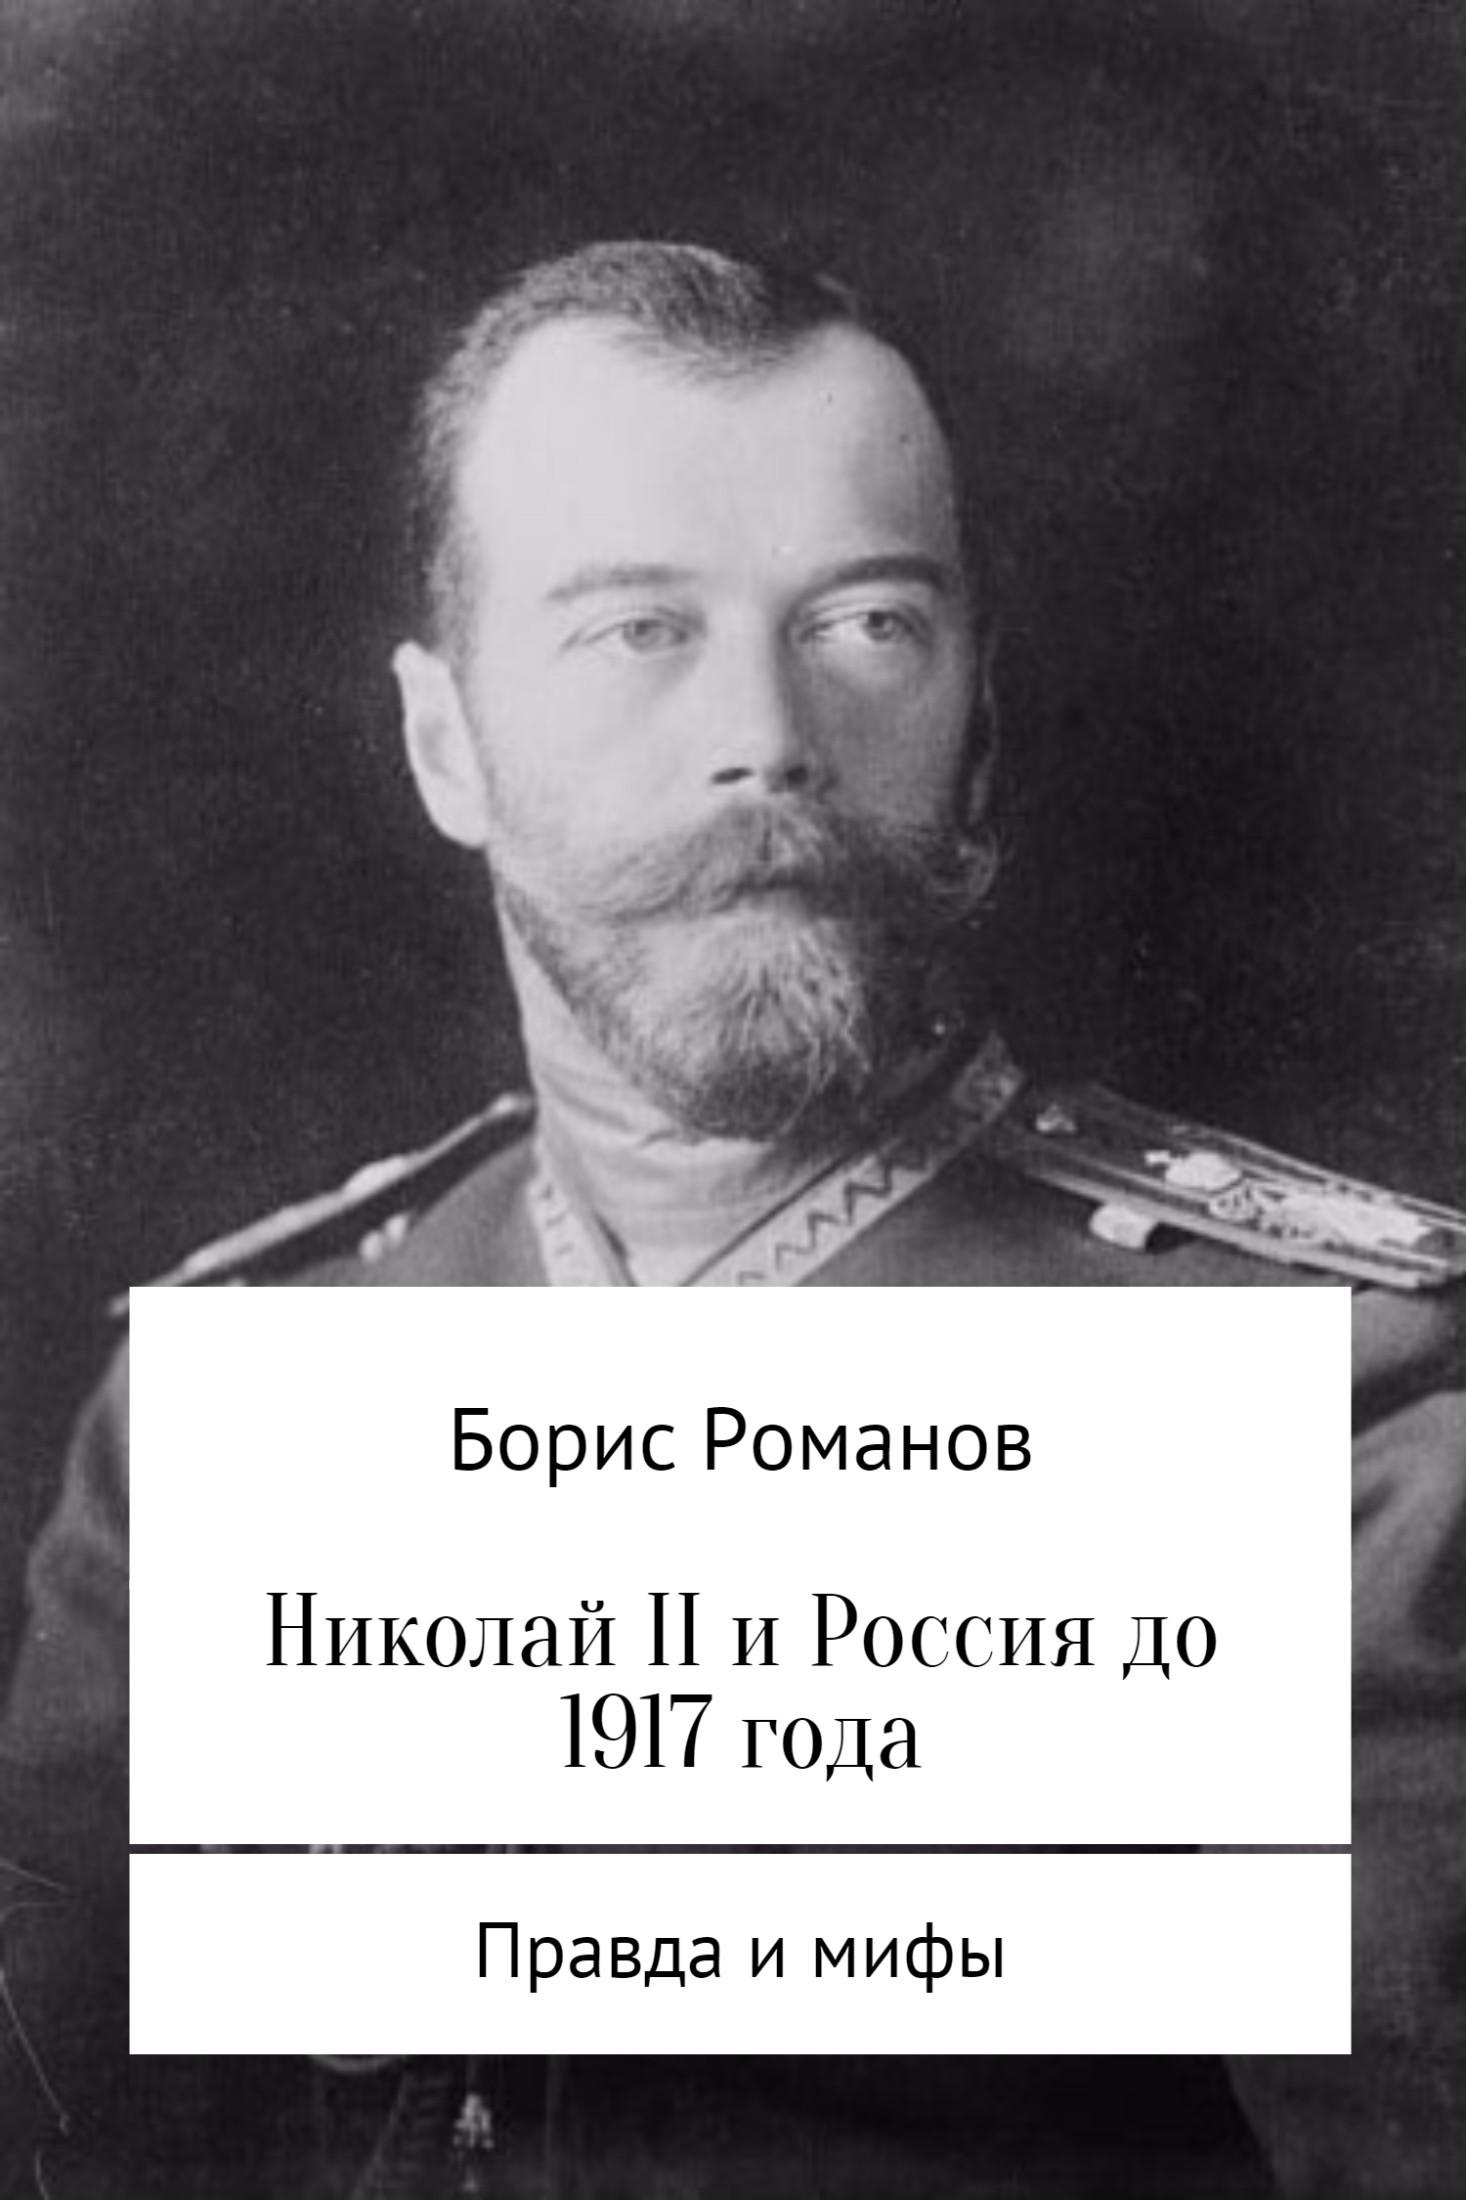 Борис Романов Николай II и Россия до 1917 года